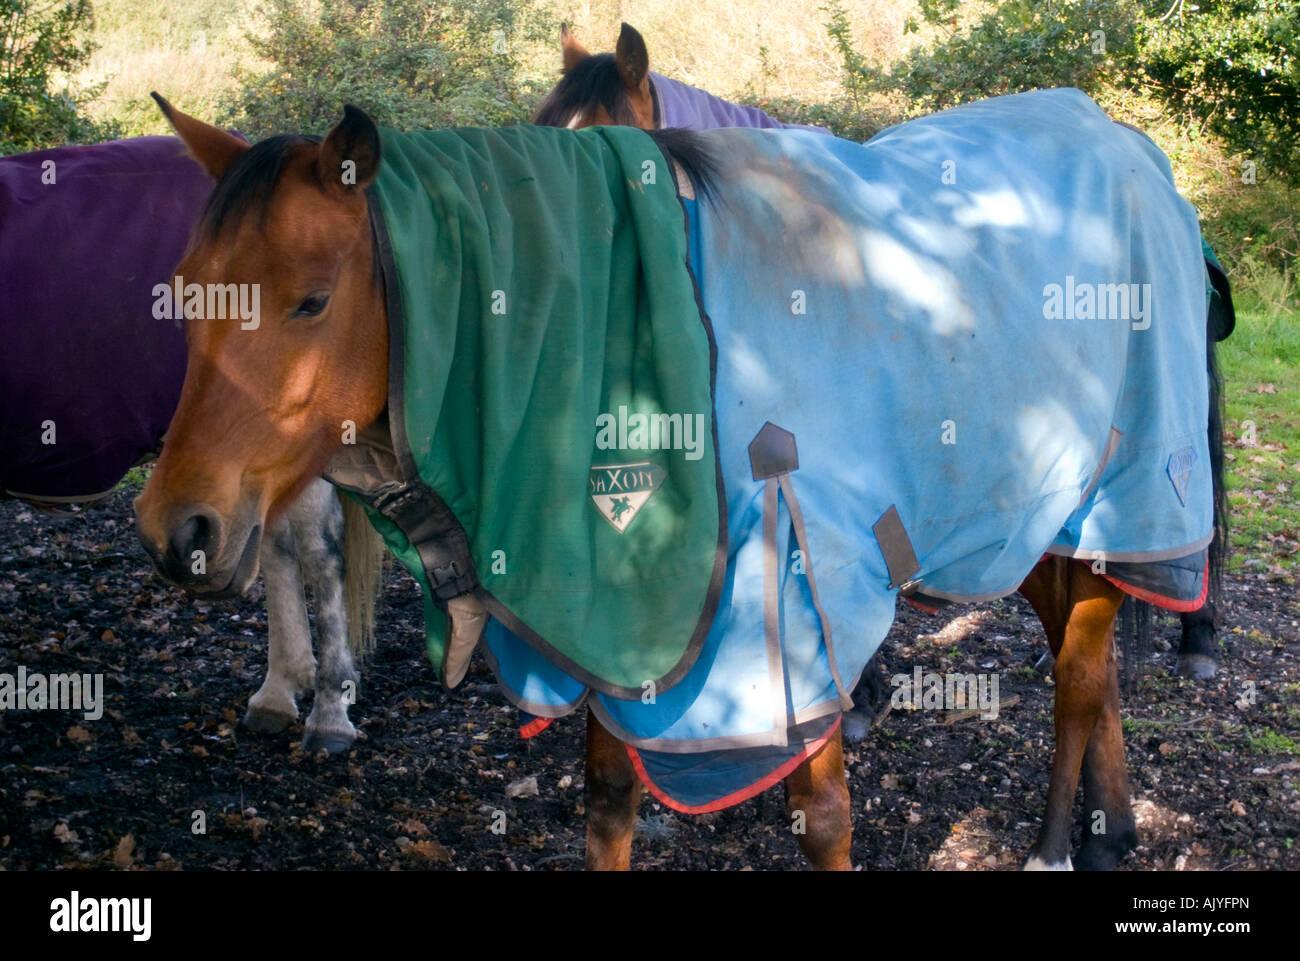 Chestnut horse in winter coat - Stock Image